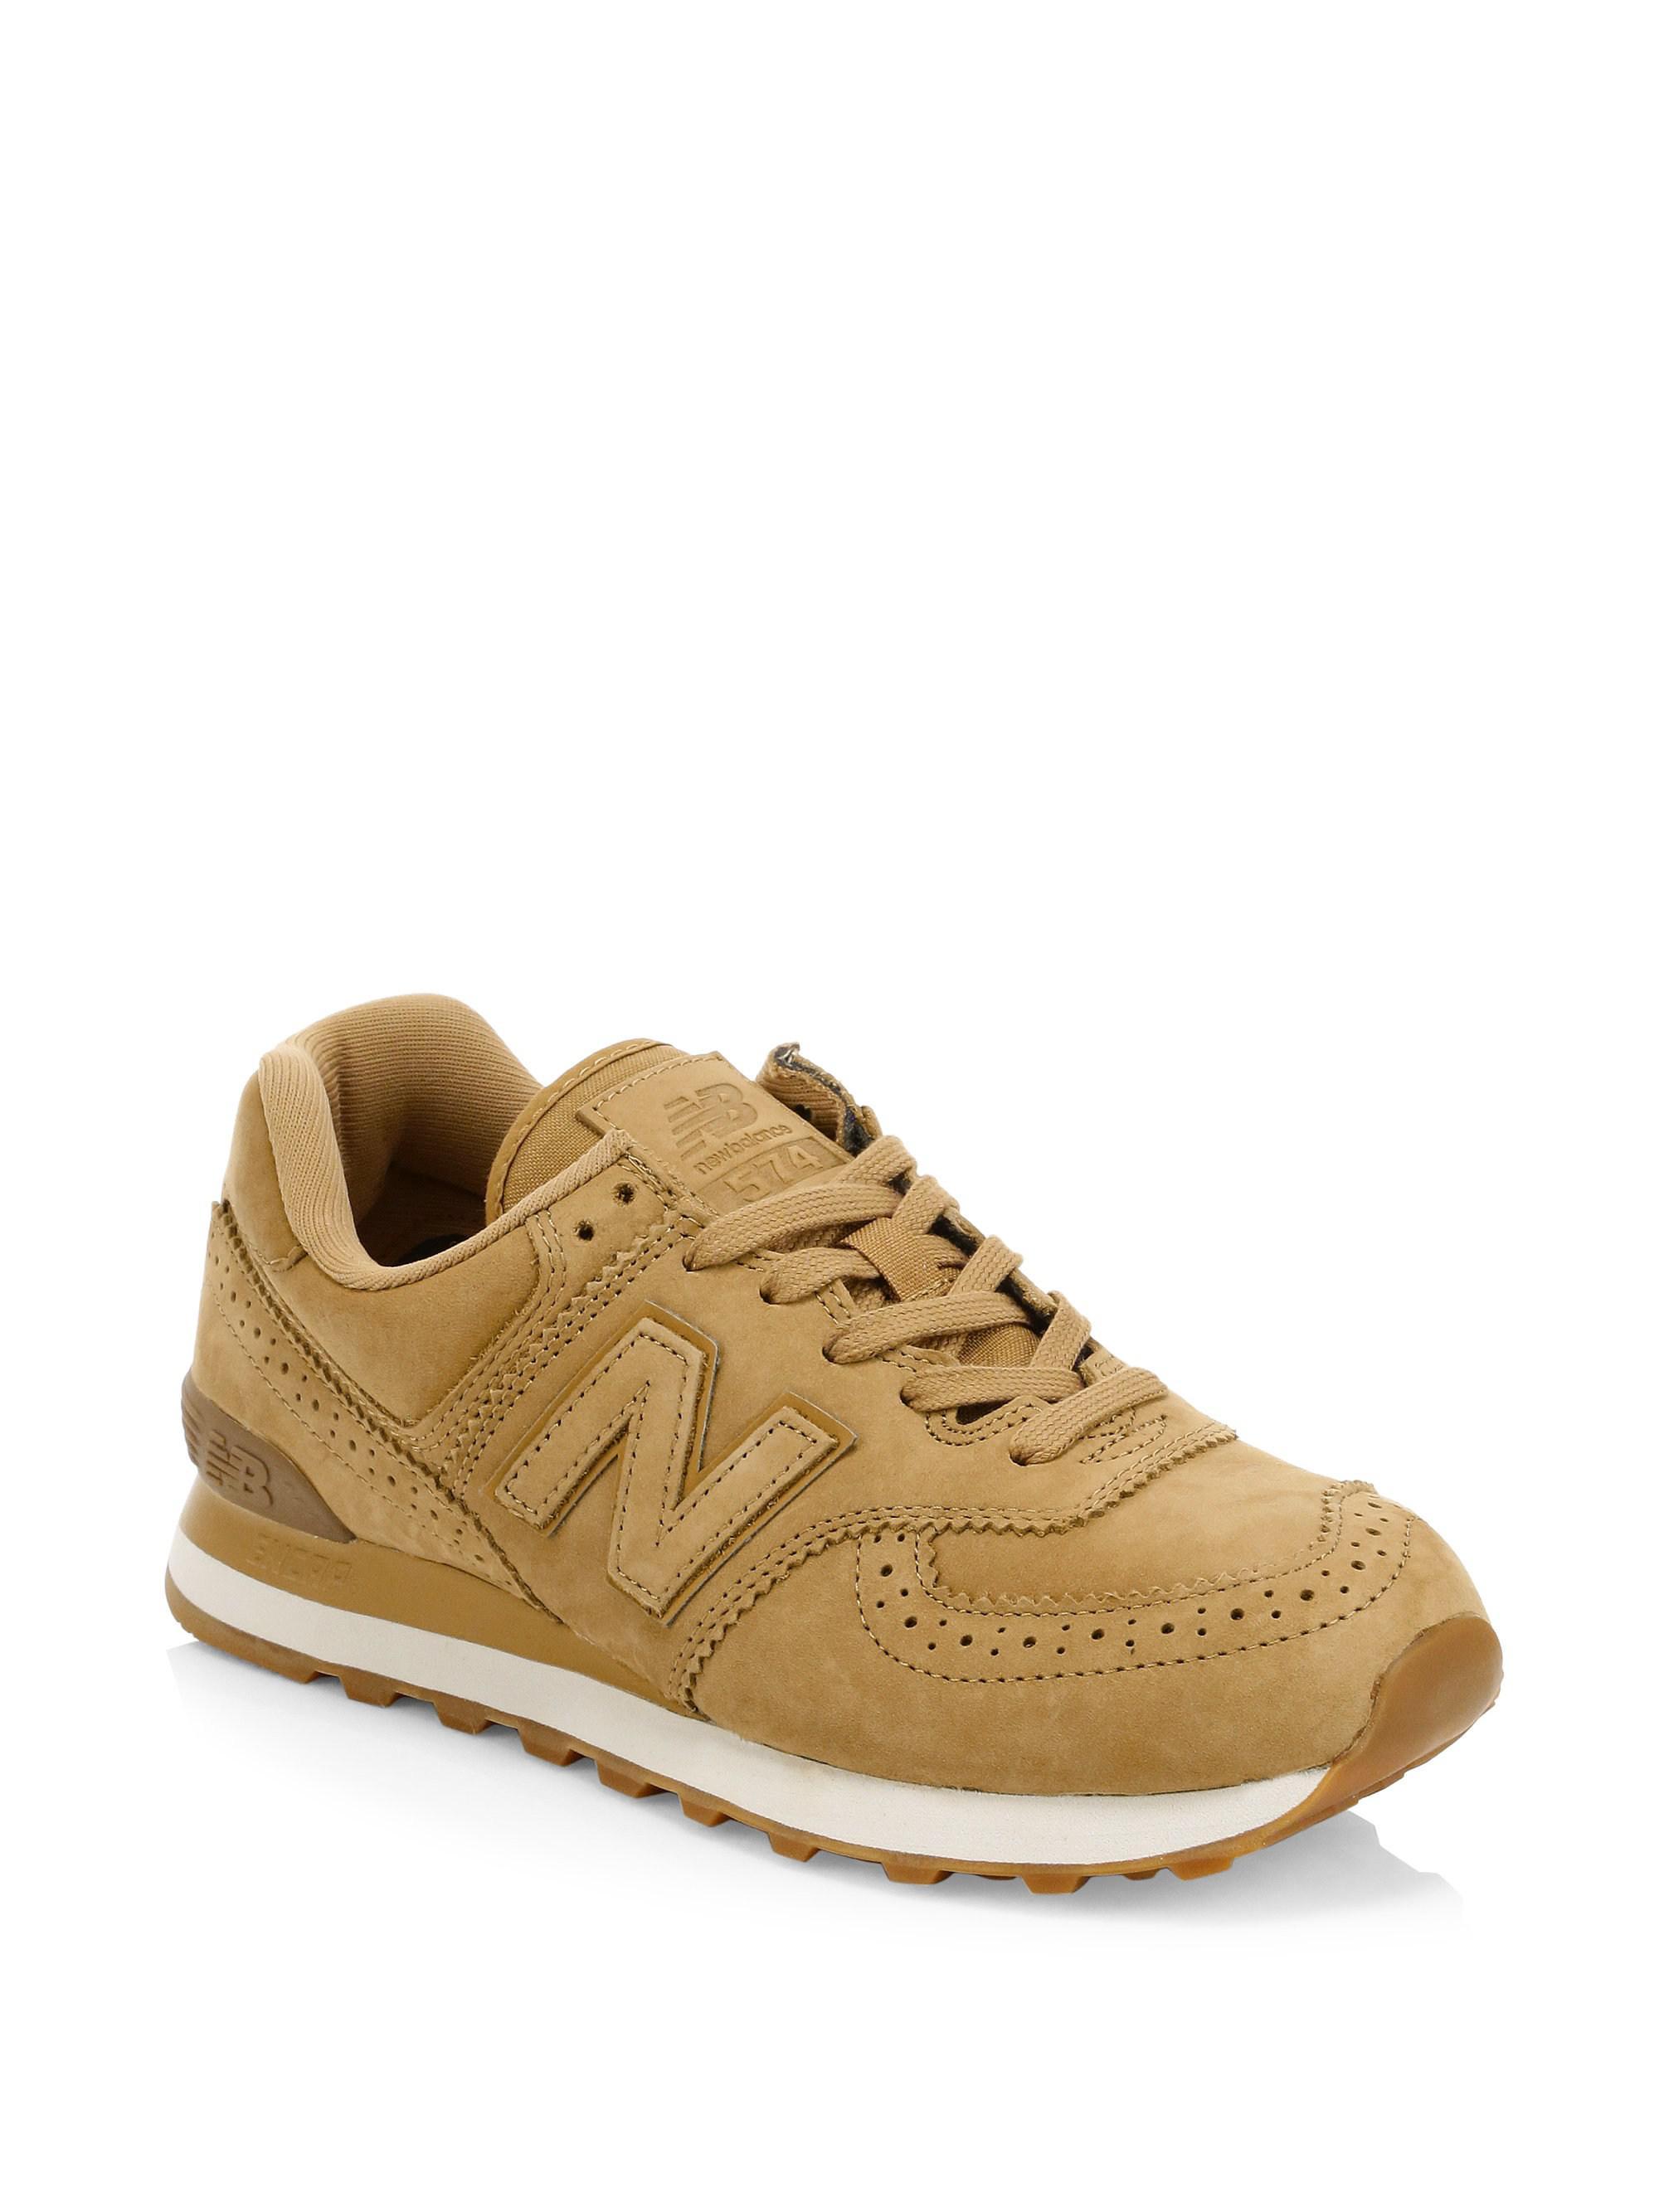 premium selection d47b7 d22ba New Balance Brown 574 Suede Brogue Sneakers for men